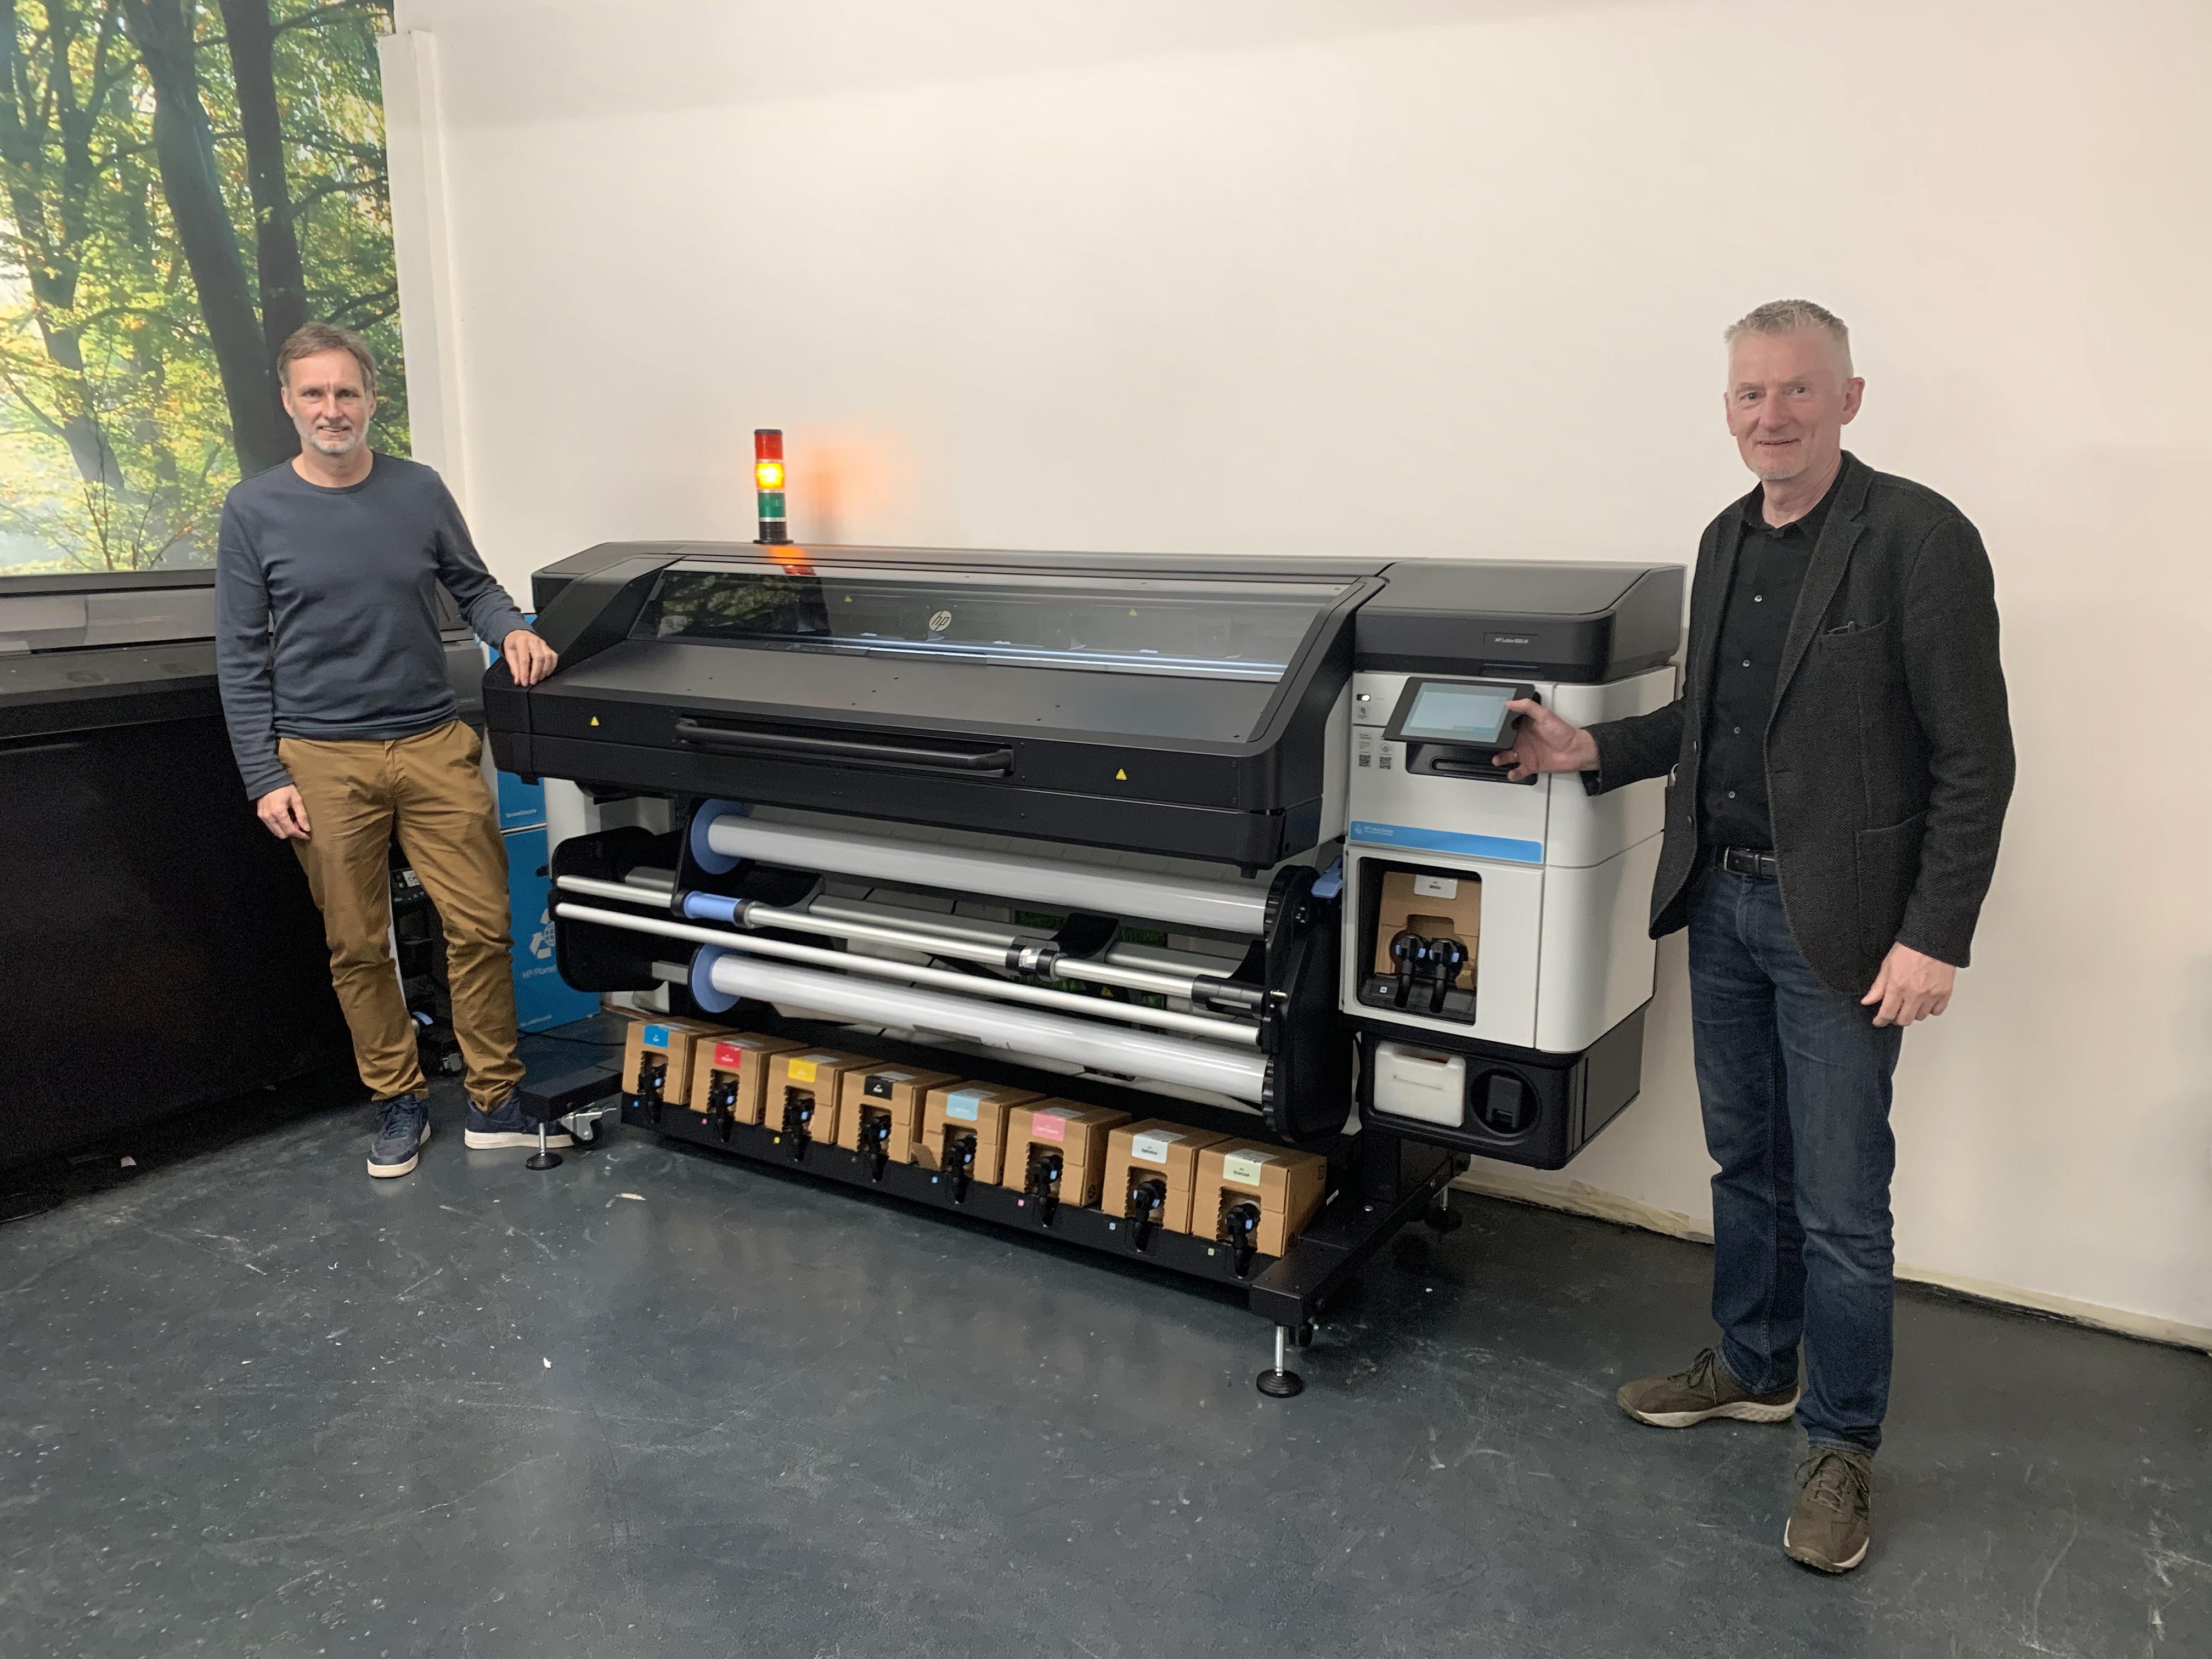 HP Latx 800 printers bij XL Reklame